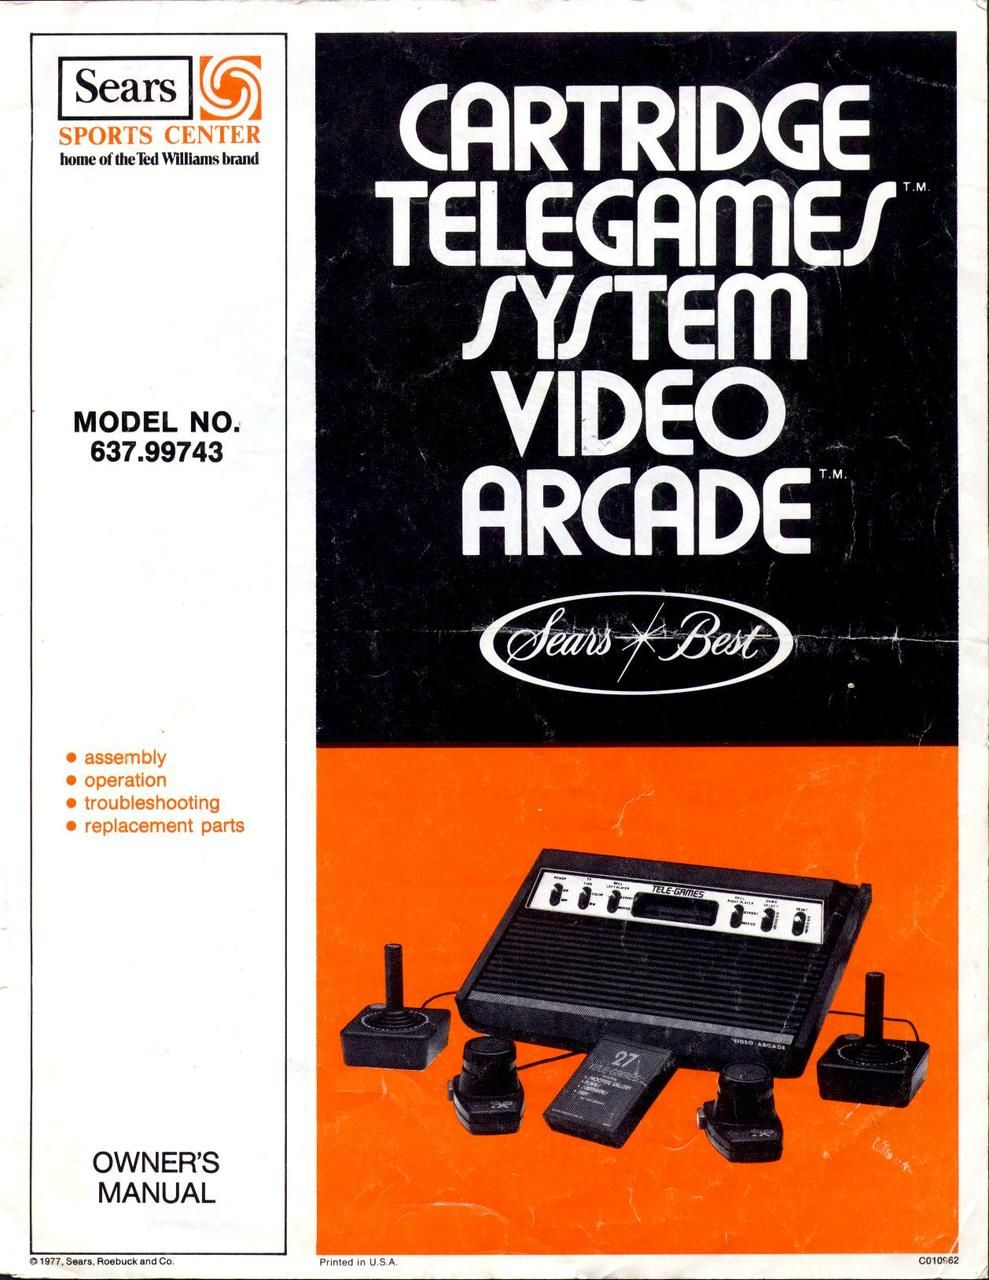 sears cartridge telegames system video arcade Classic